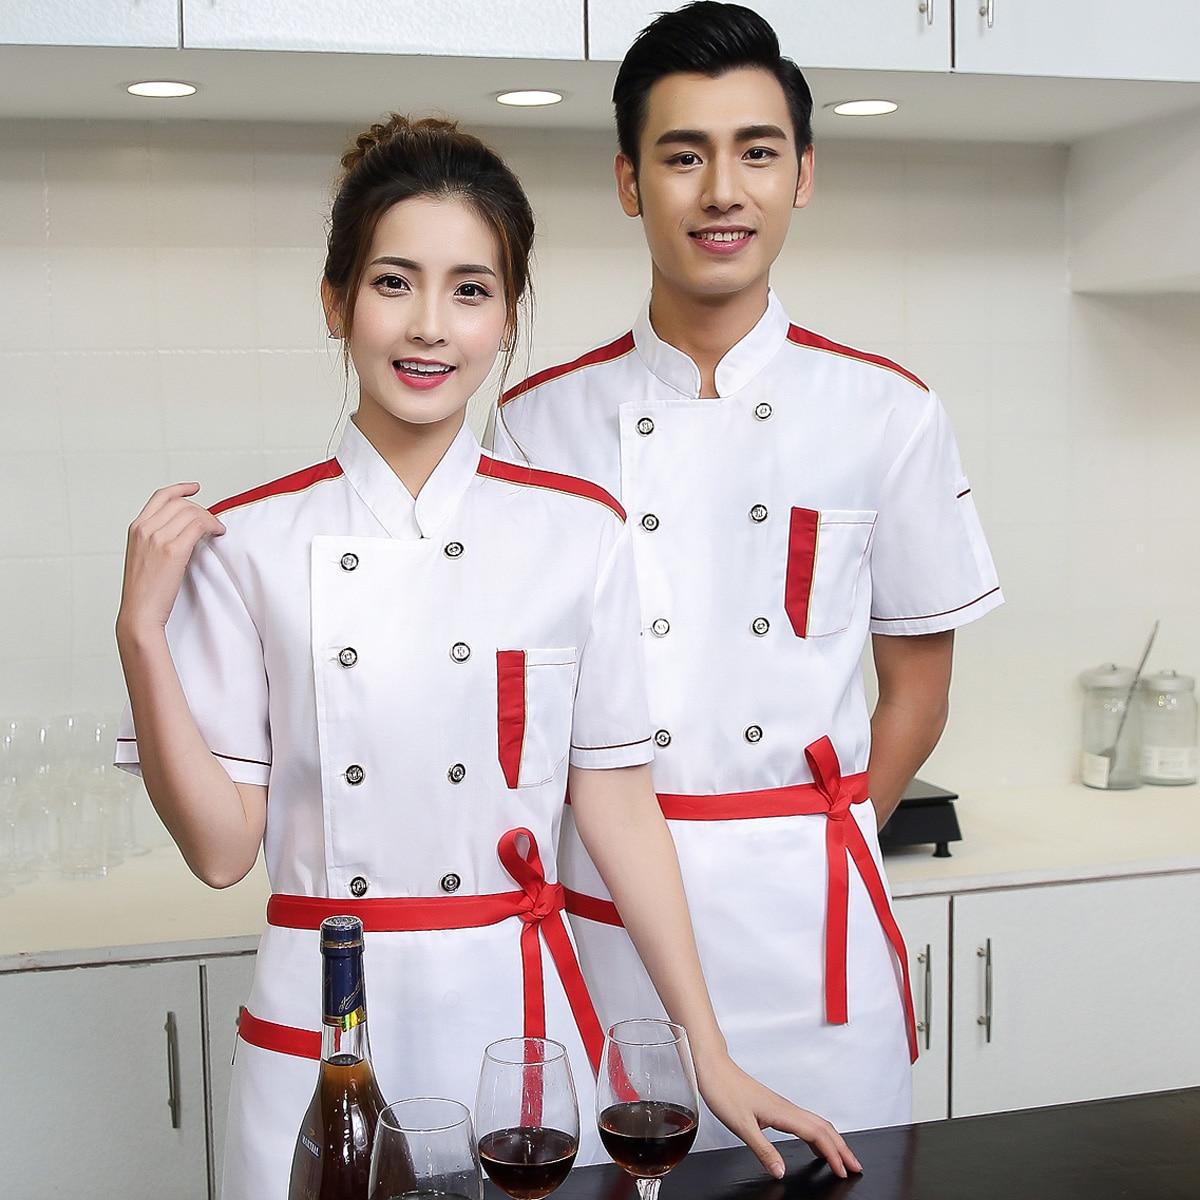 Aliexpress.com  Comprar Chef Wear de manga corta uniforme de verano hotel  restaurante cocina ropa camareros uniformes restaurante ropa de trabajo  global ... 8239f8bd931